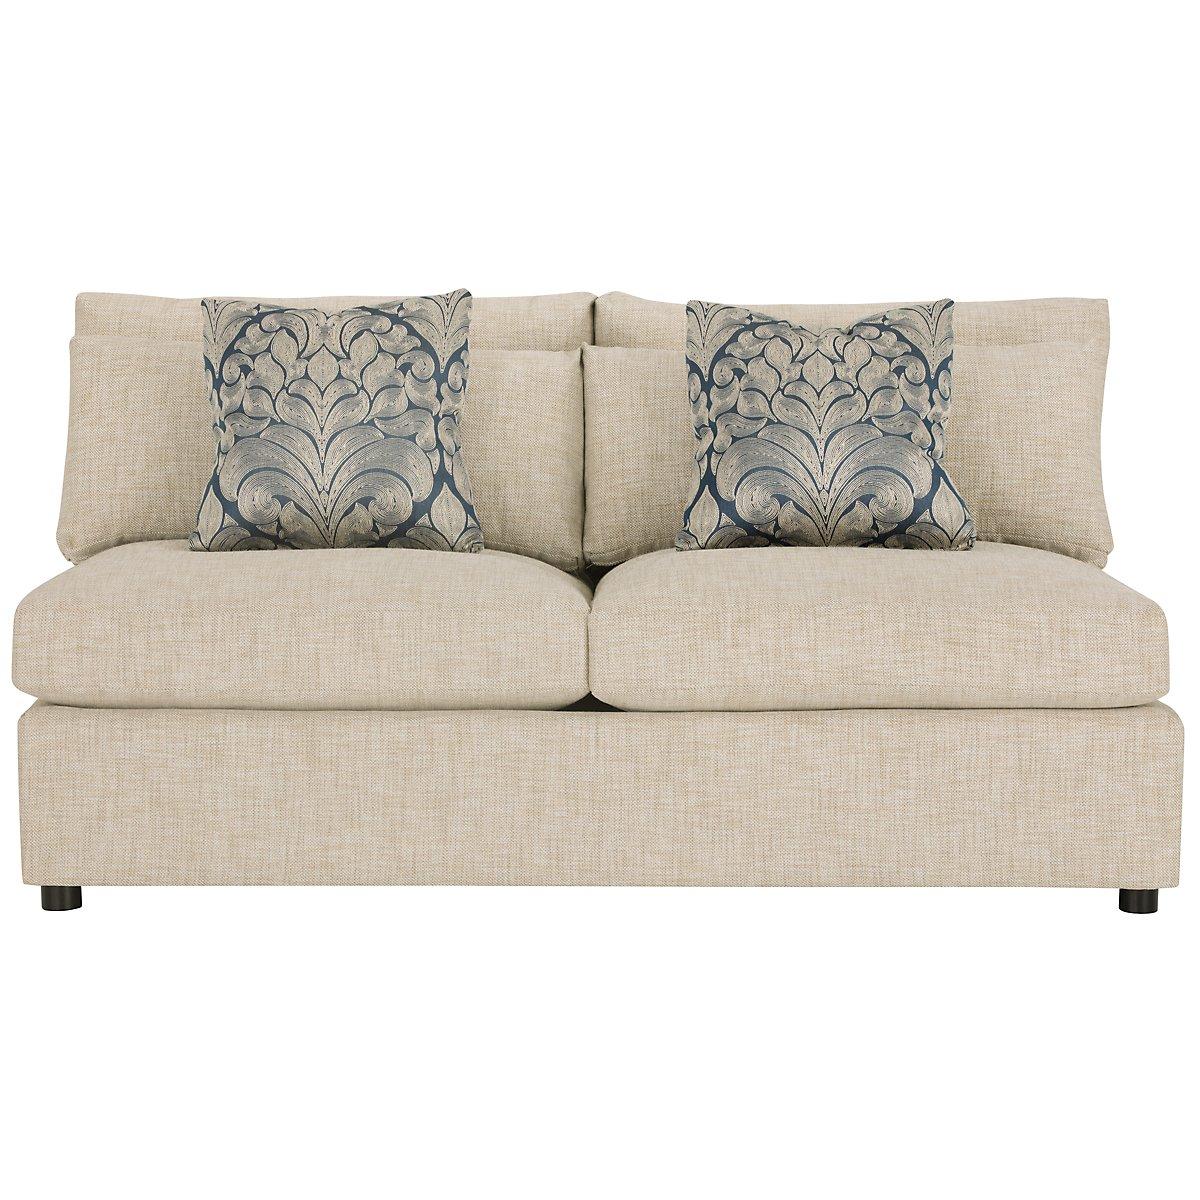 city furniture como beige fabric large sofa. Black Bedroom Furniture Sets. Home Design Ideas